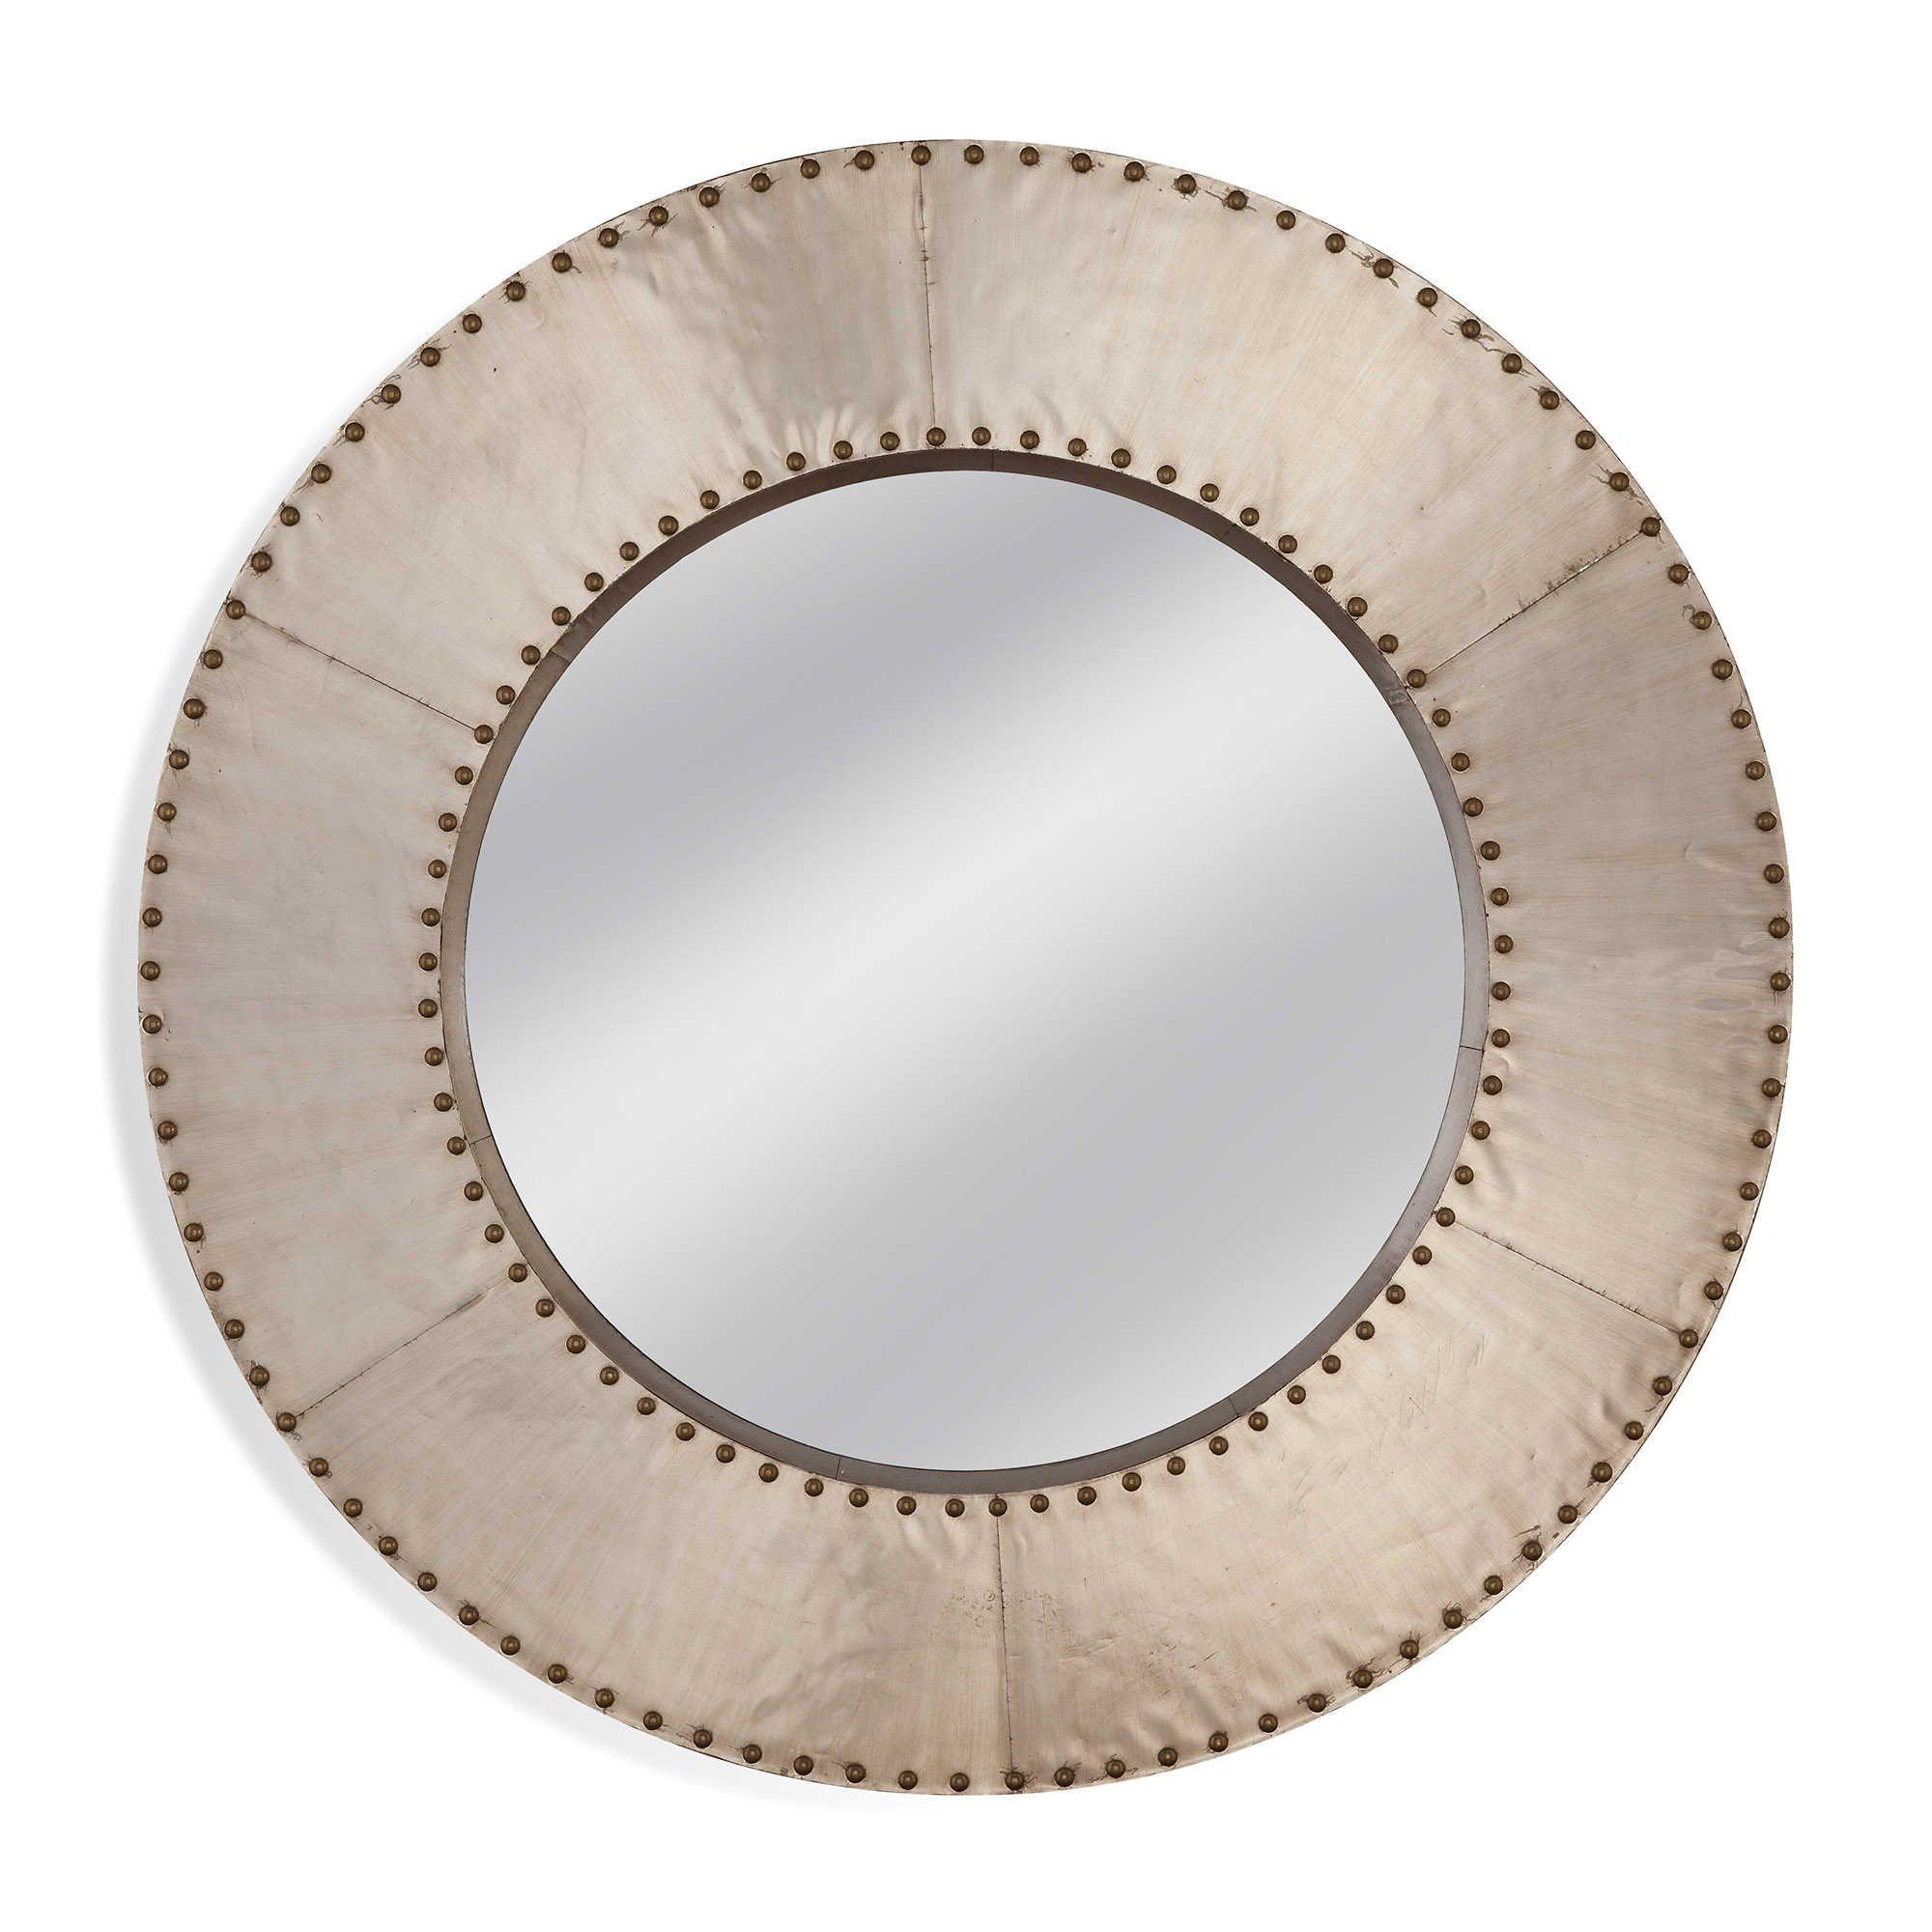 Basset Mirror Company Lexington 40 Inch Round Mirror In Aluminum